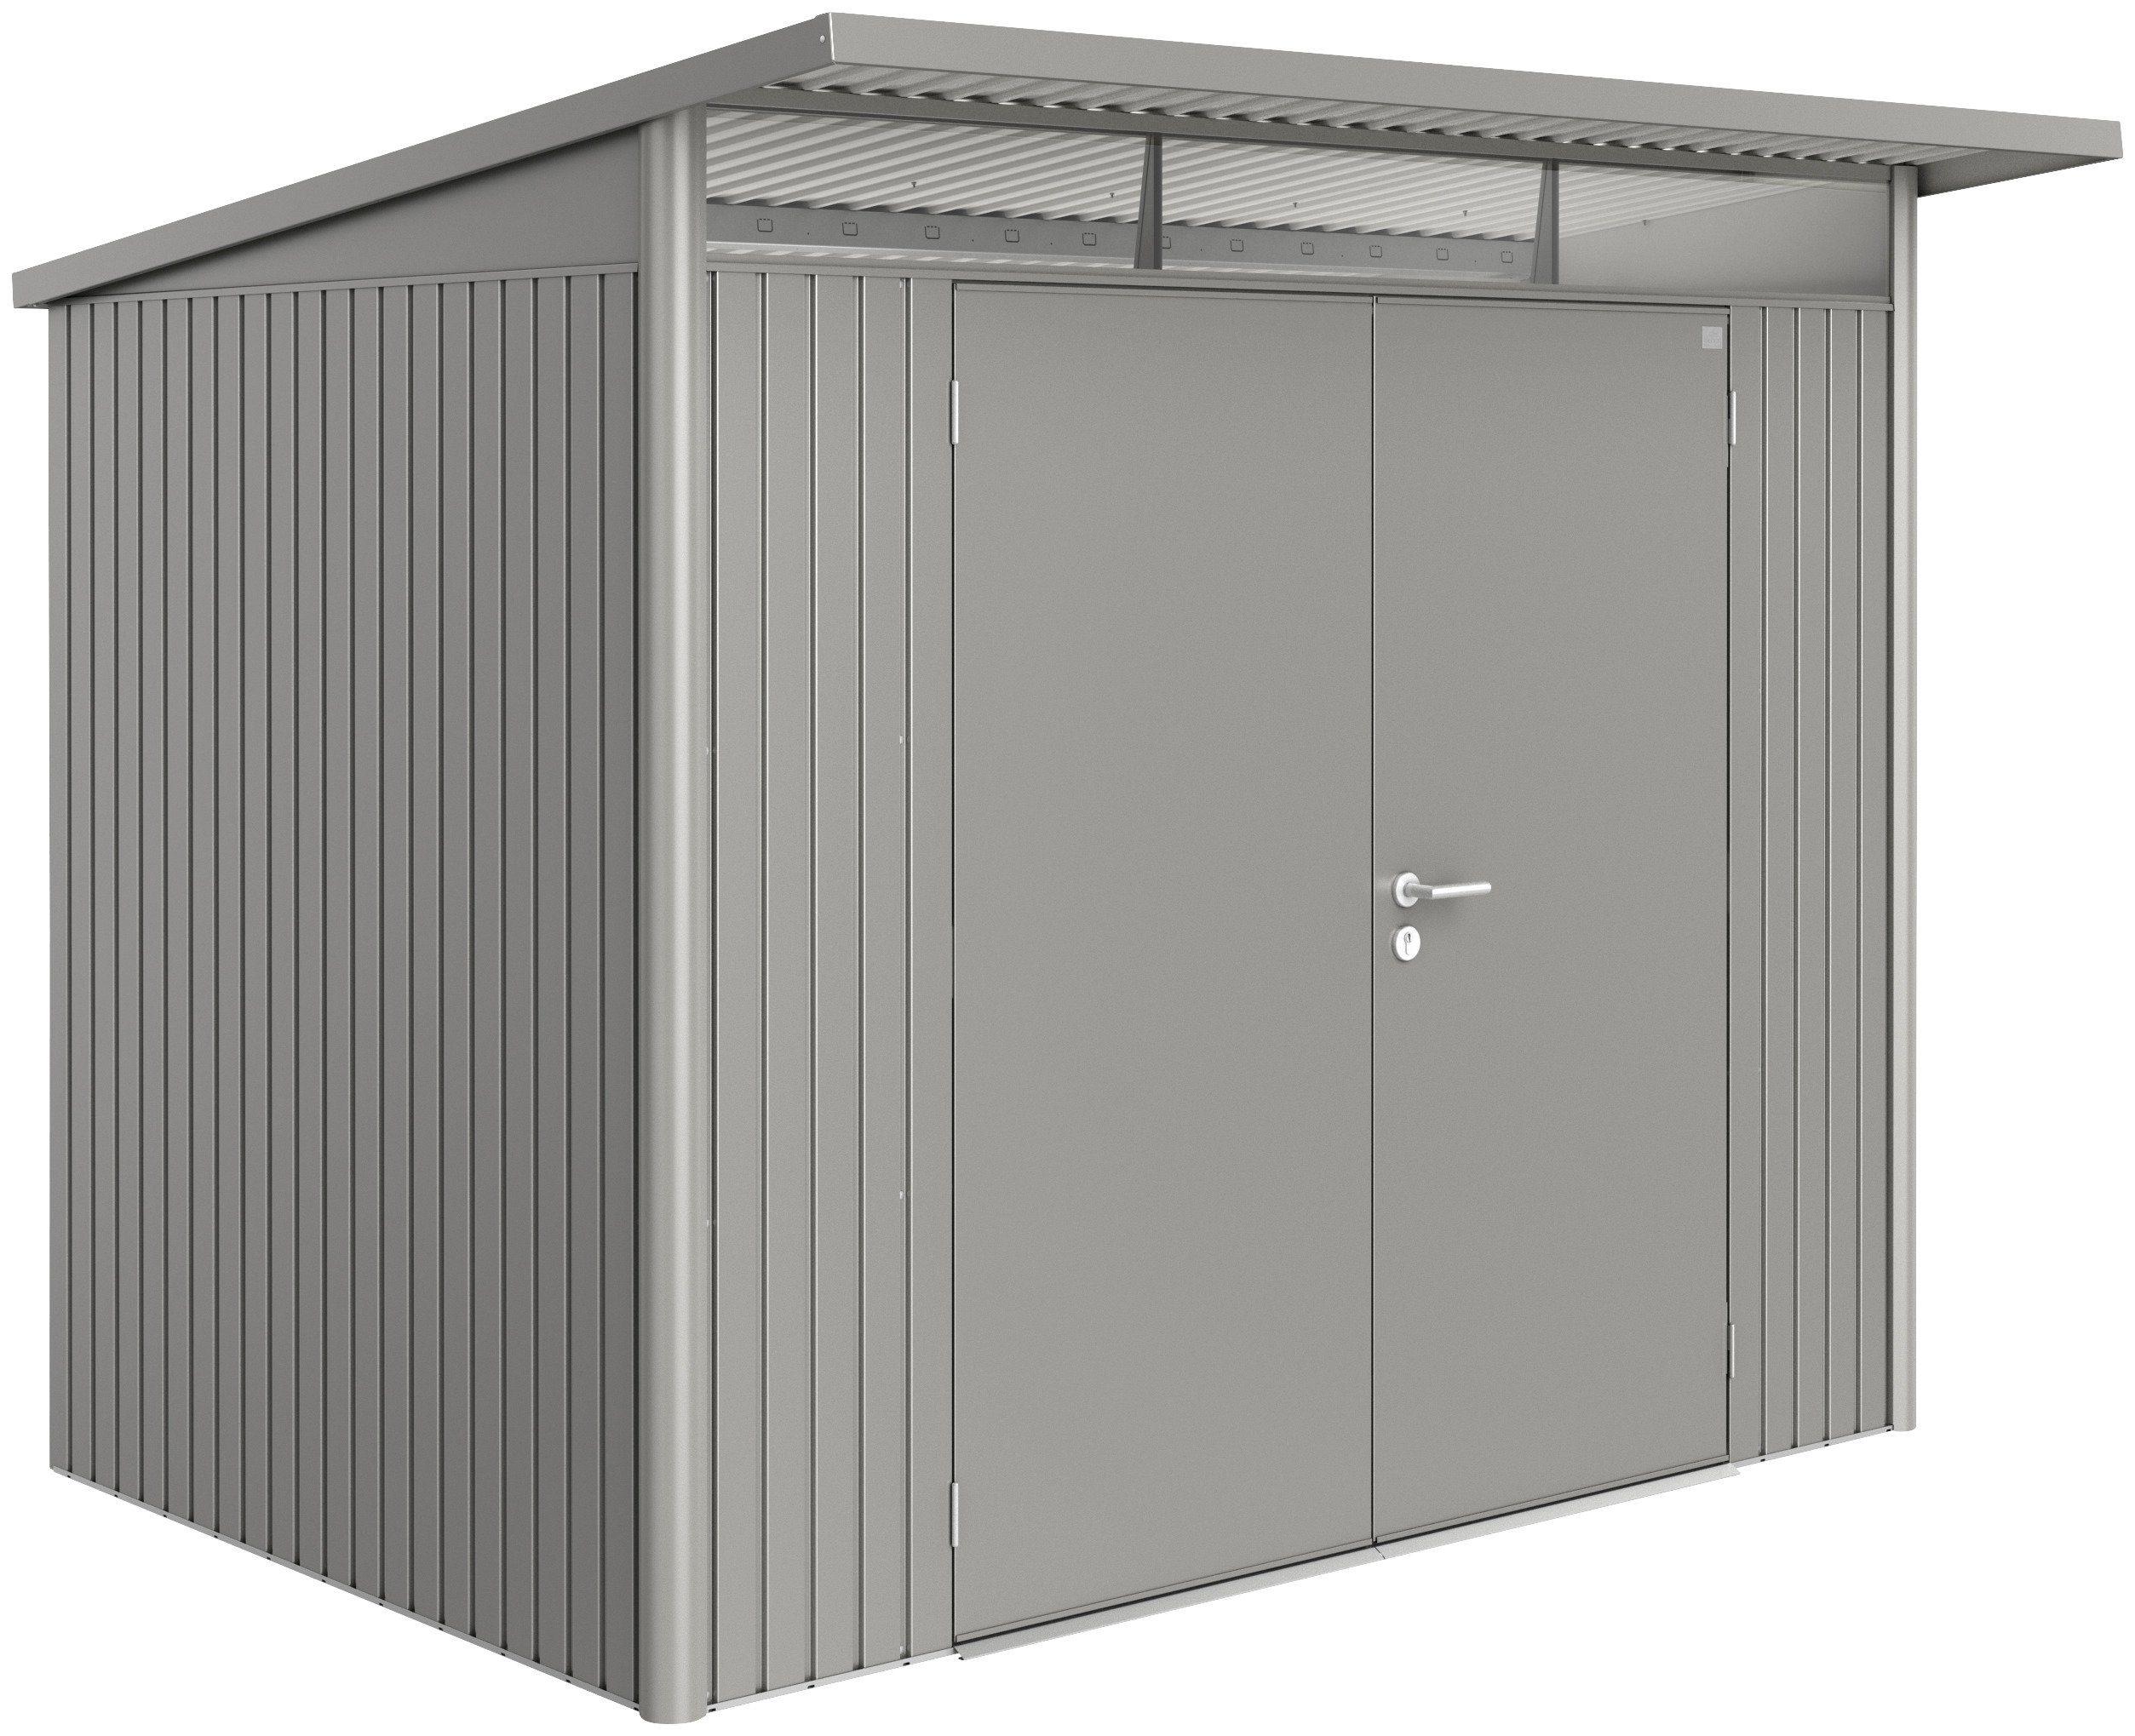 BIOHORT Stahlgerätehaus »AvantGarde L«, BxT: 257x177 cm, quarzgrau-metallic